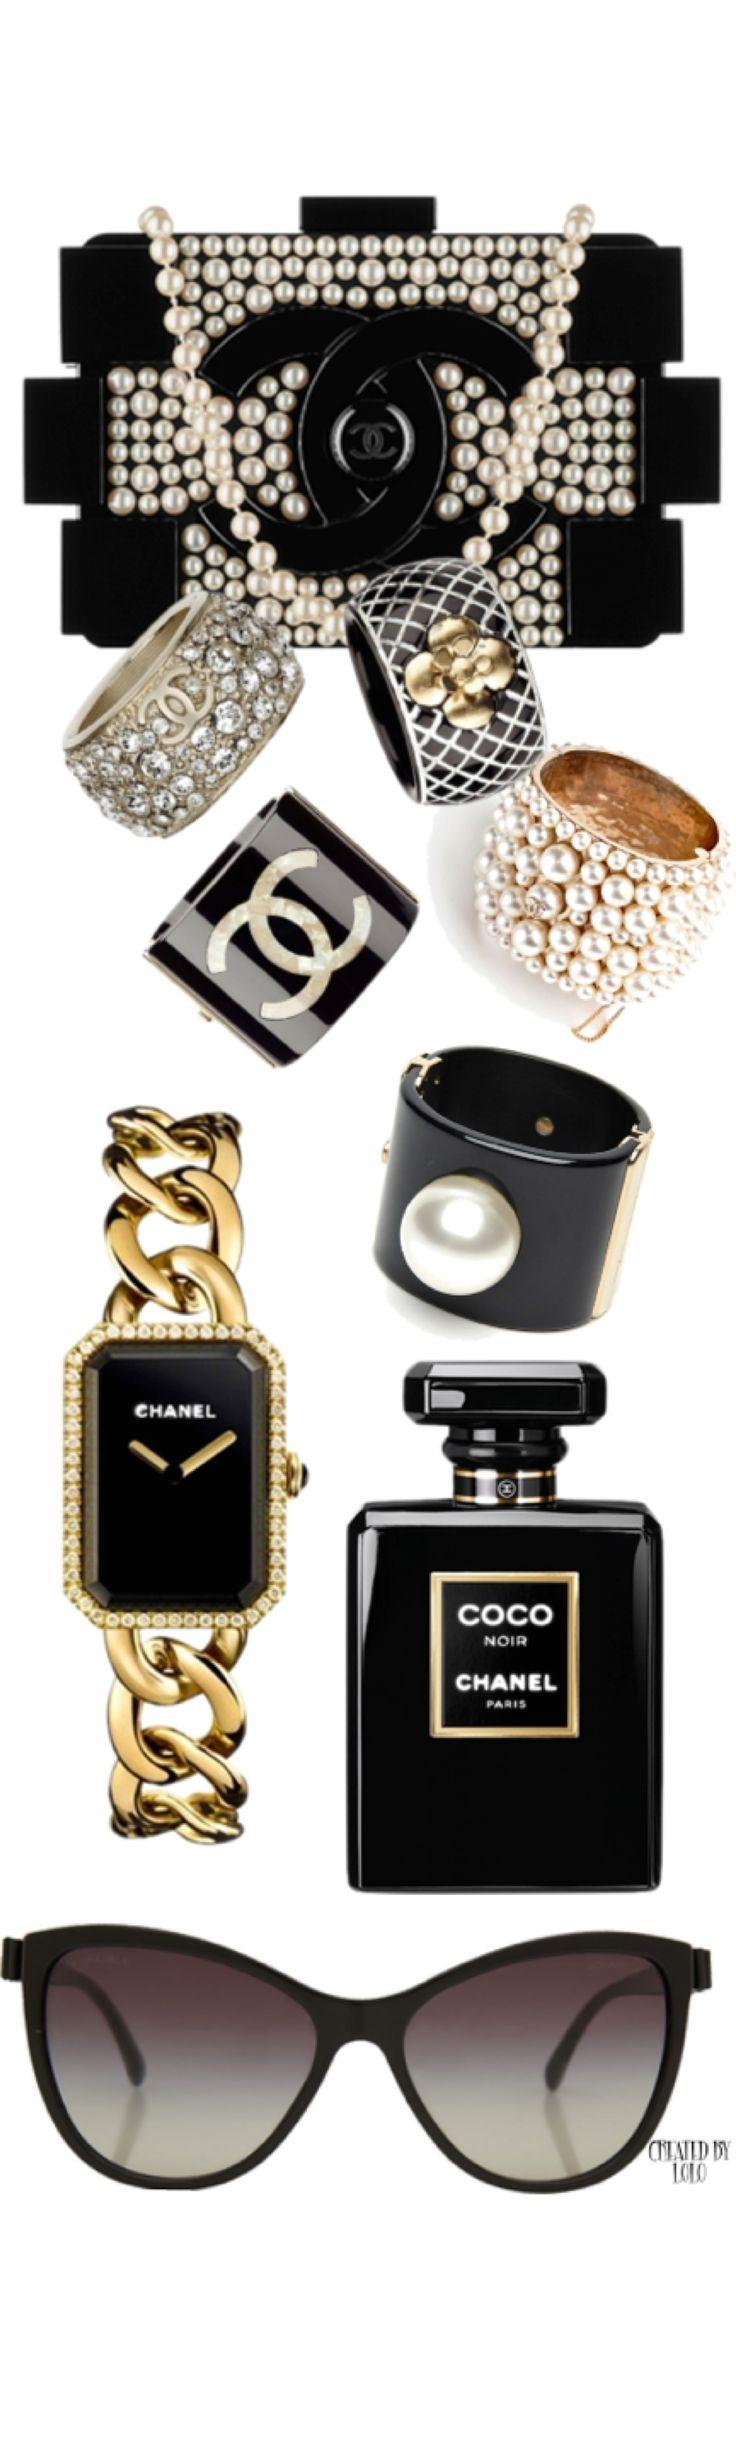 Chanel accessories                                                                                                                                                                                 More